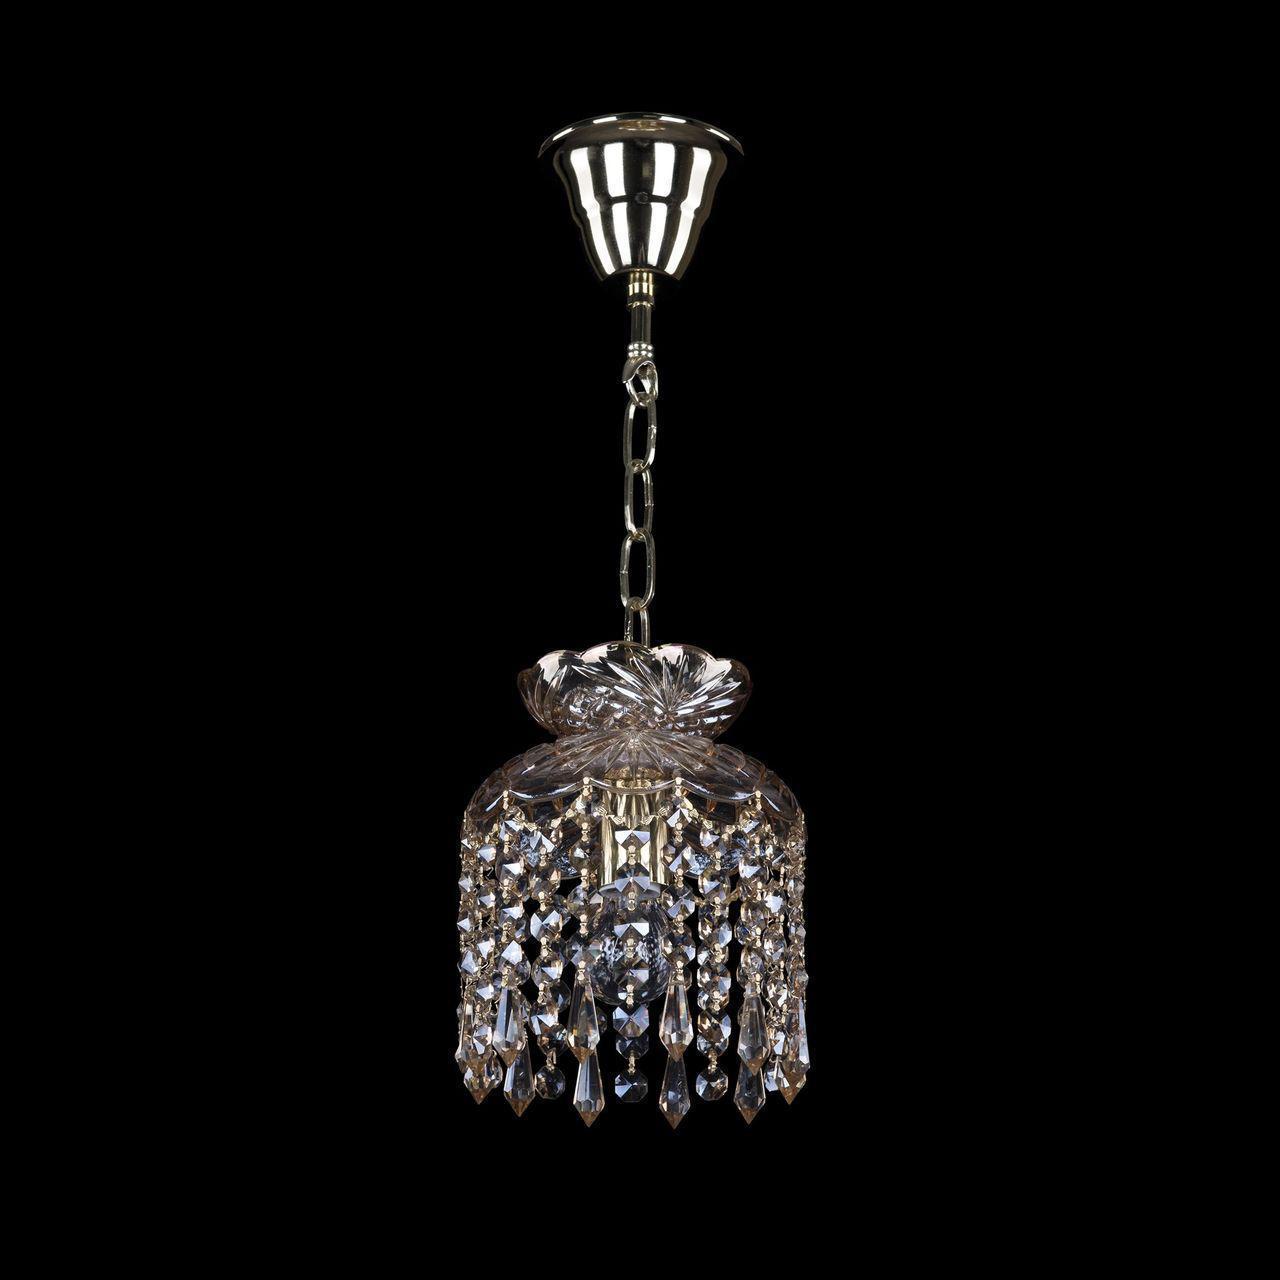 Подвесной светильник Bohemia Ivele 14781/15 G Drops M721